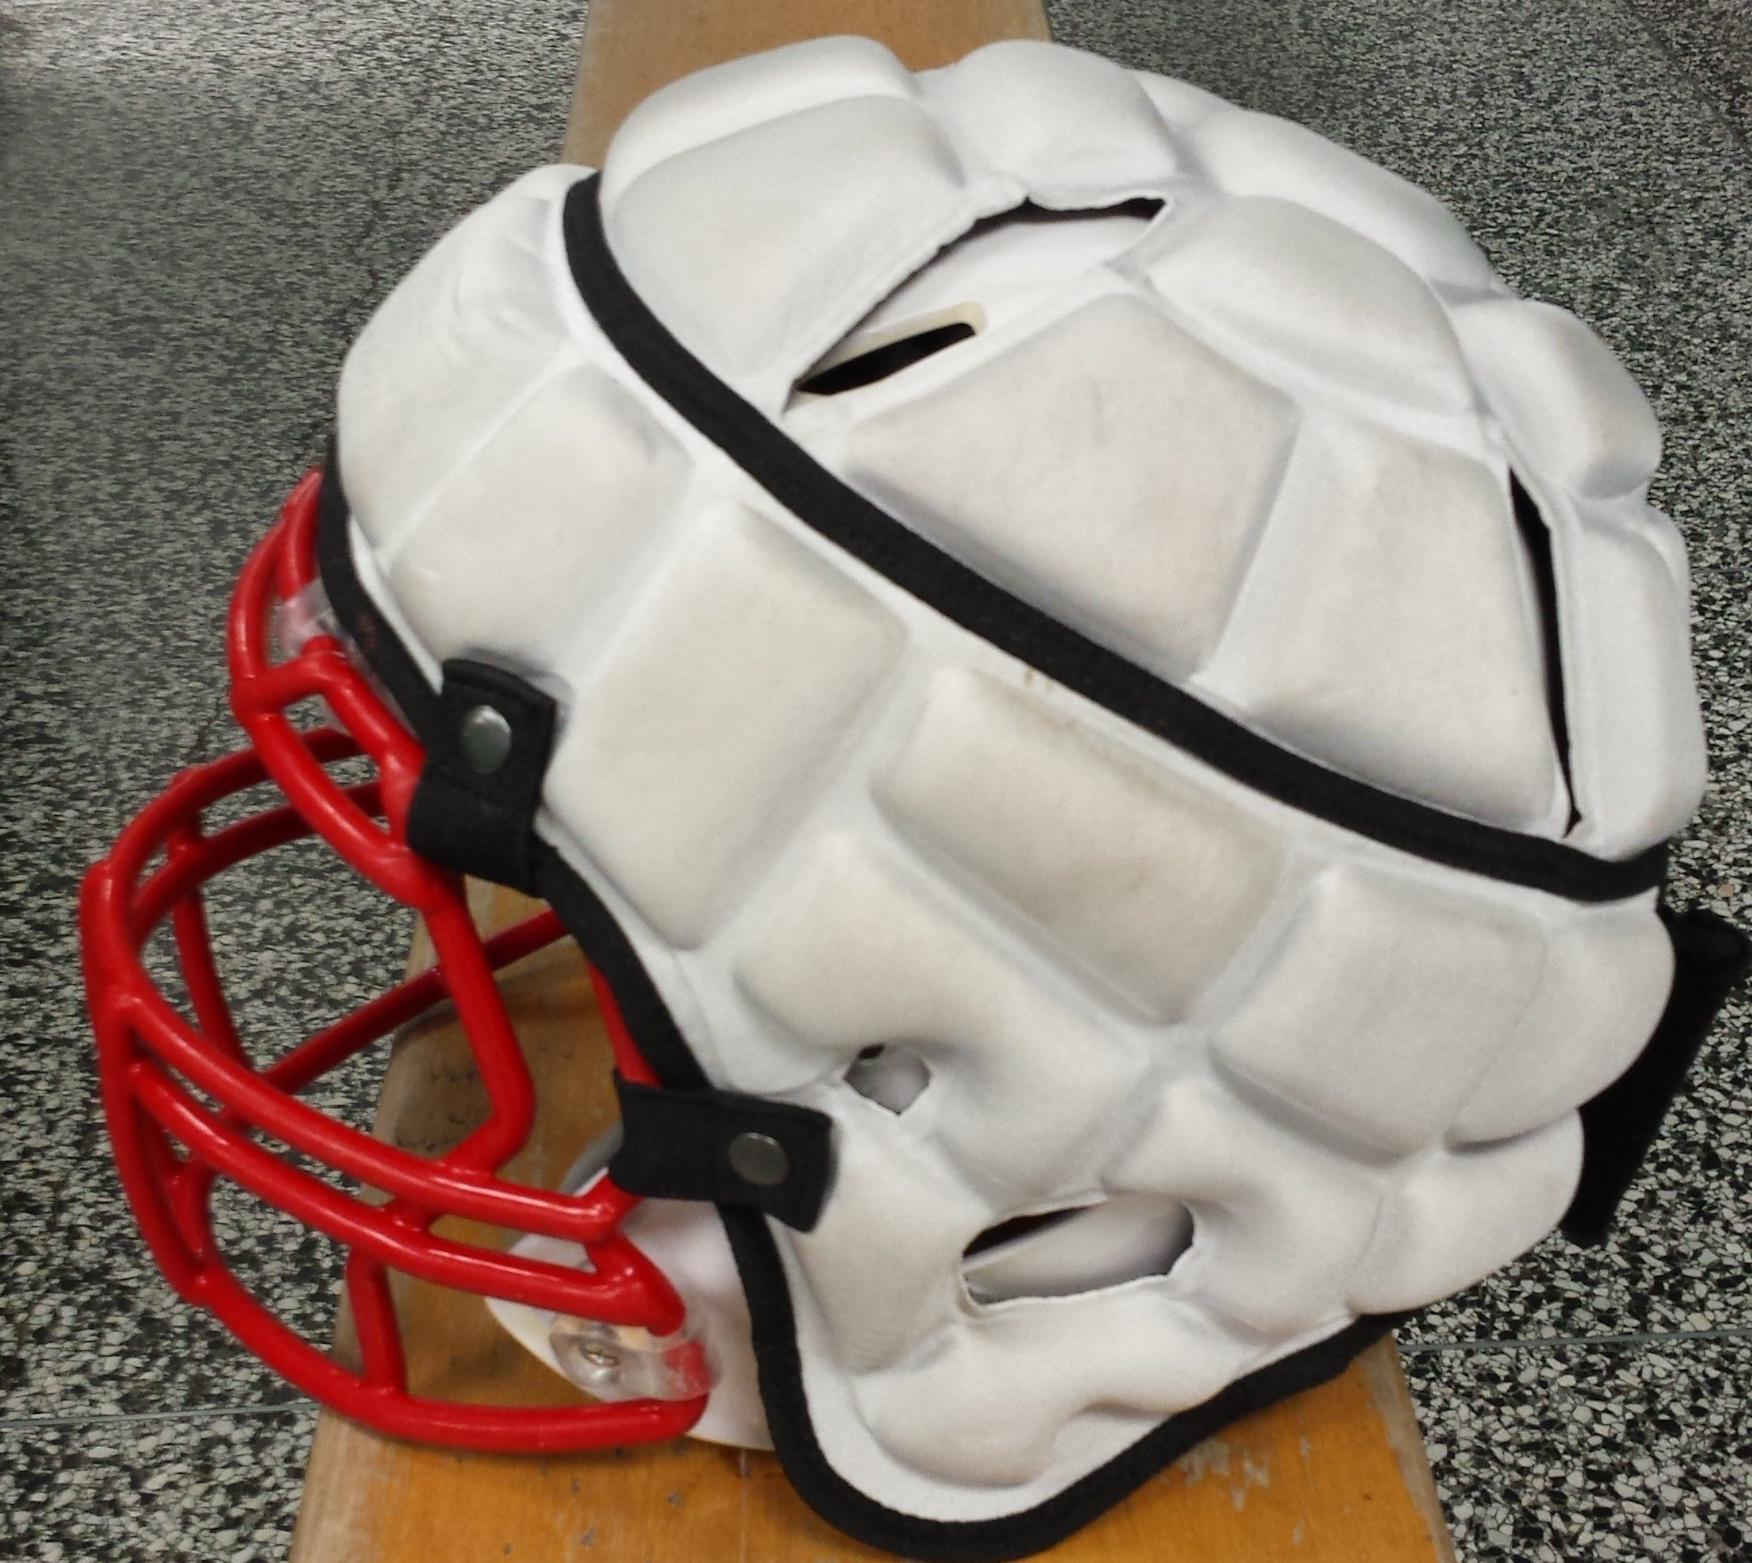 Football Team Adopts New Protective Headgear